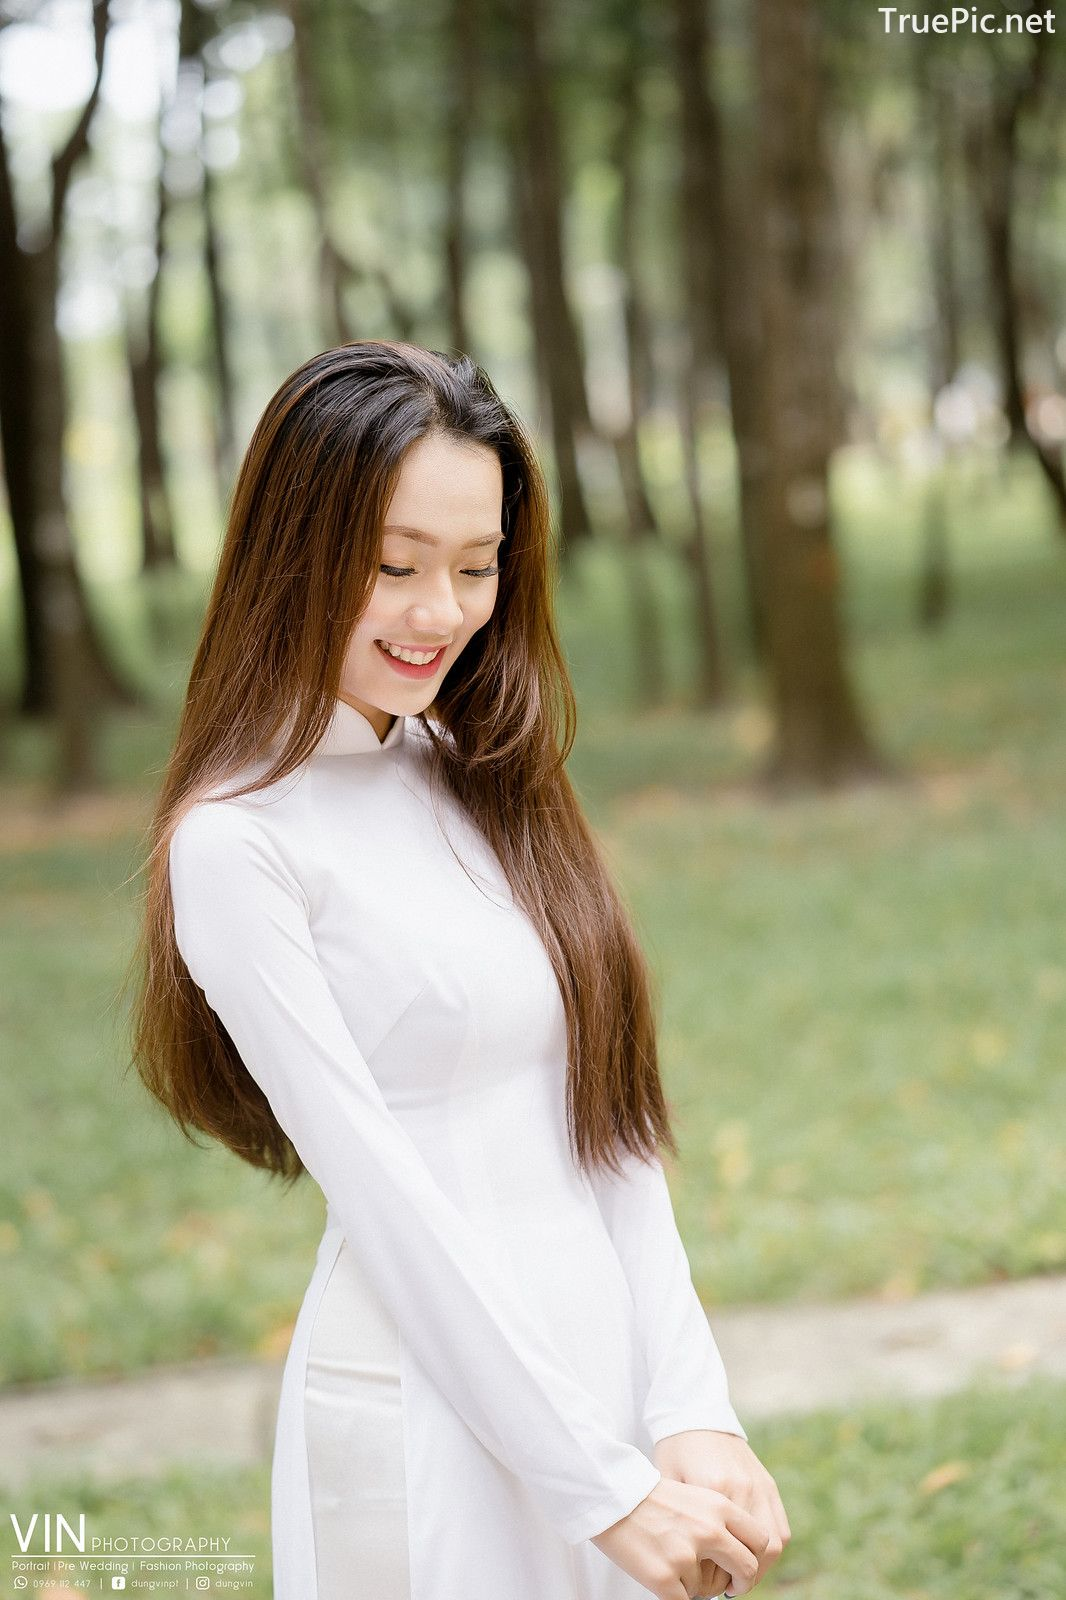 Vietnamese Beautiful Girl - Ao Dai Vietnam Traditional